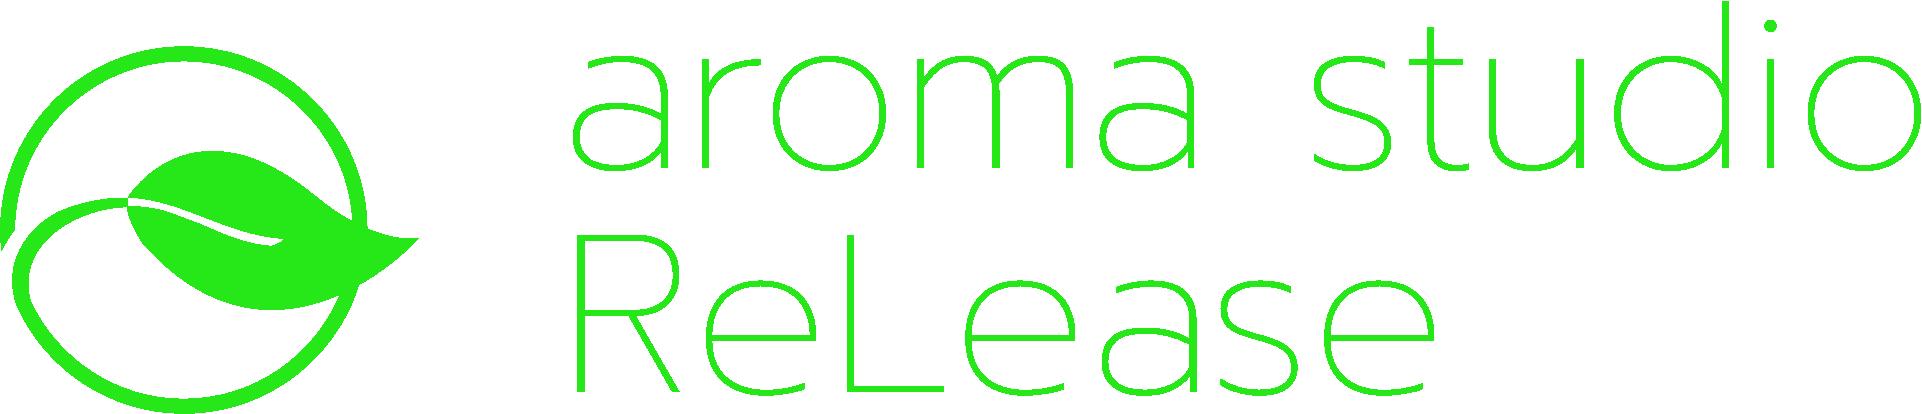 aroma studio Release アロマスタジオ リリース